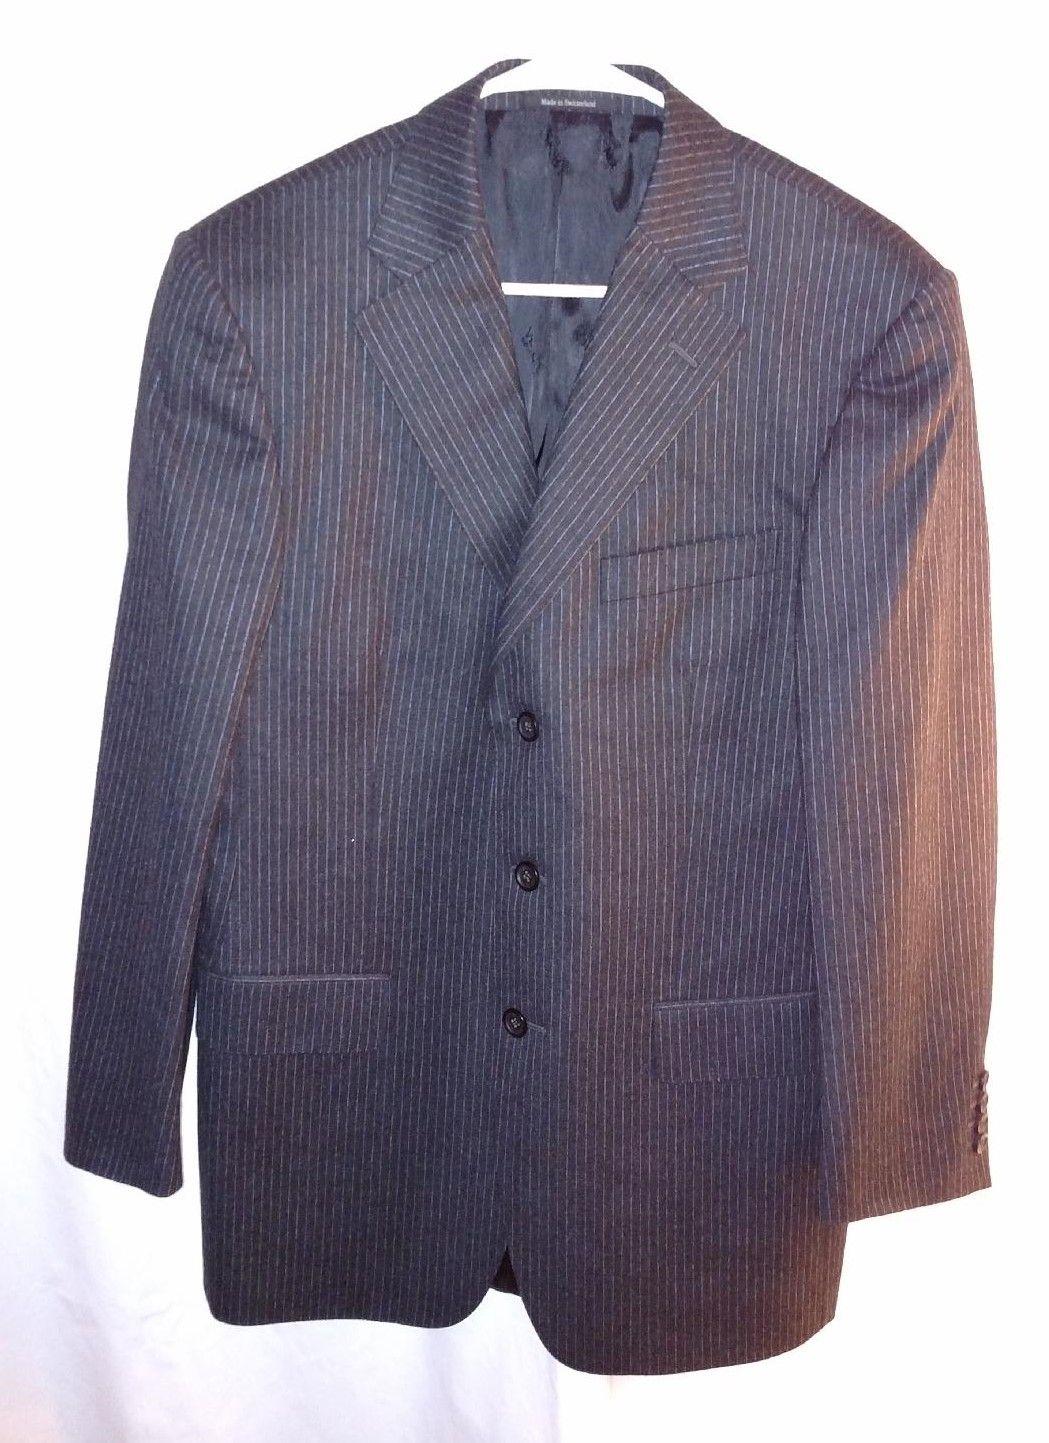 Versace mens pinstripe blazer sportcoat fashion